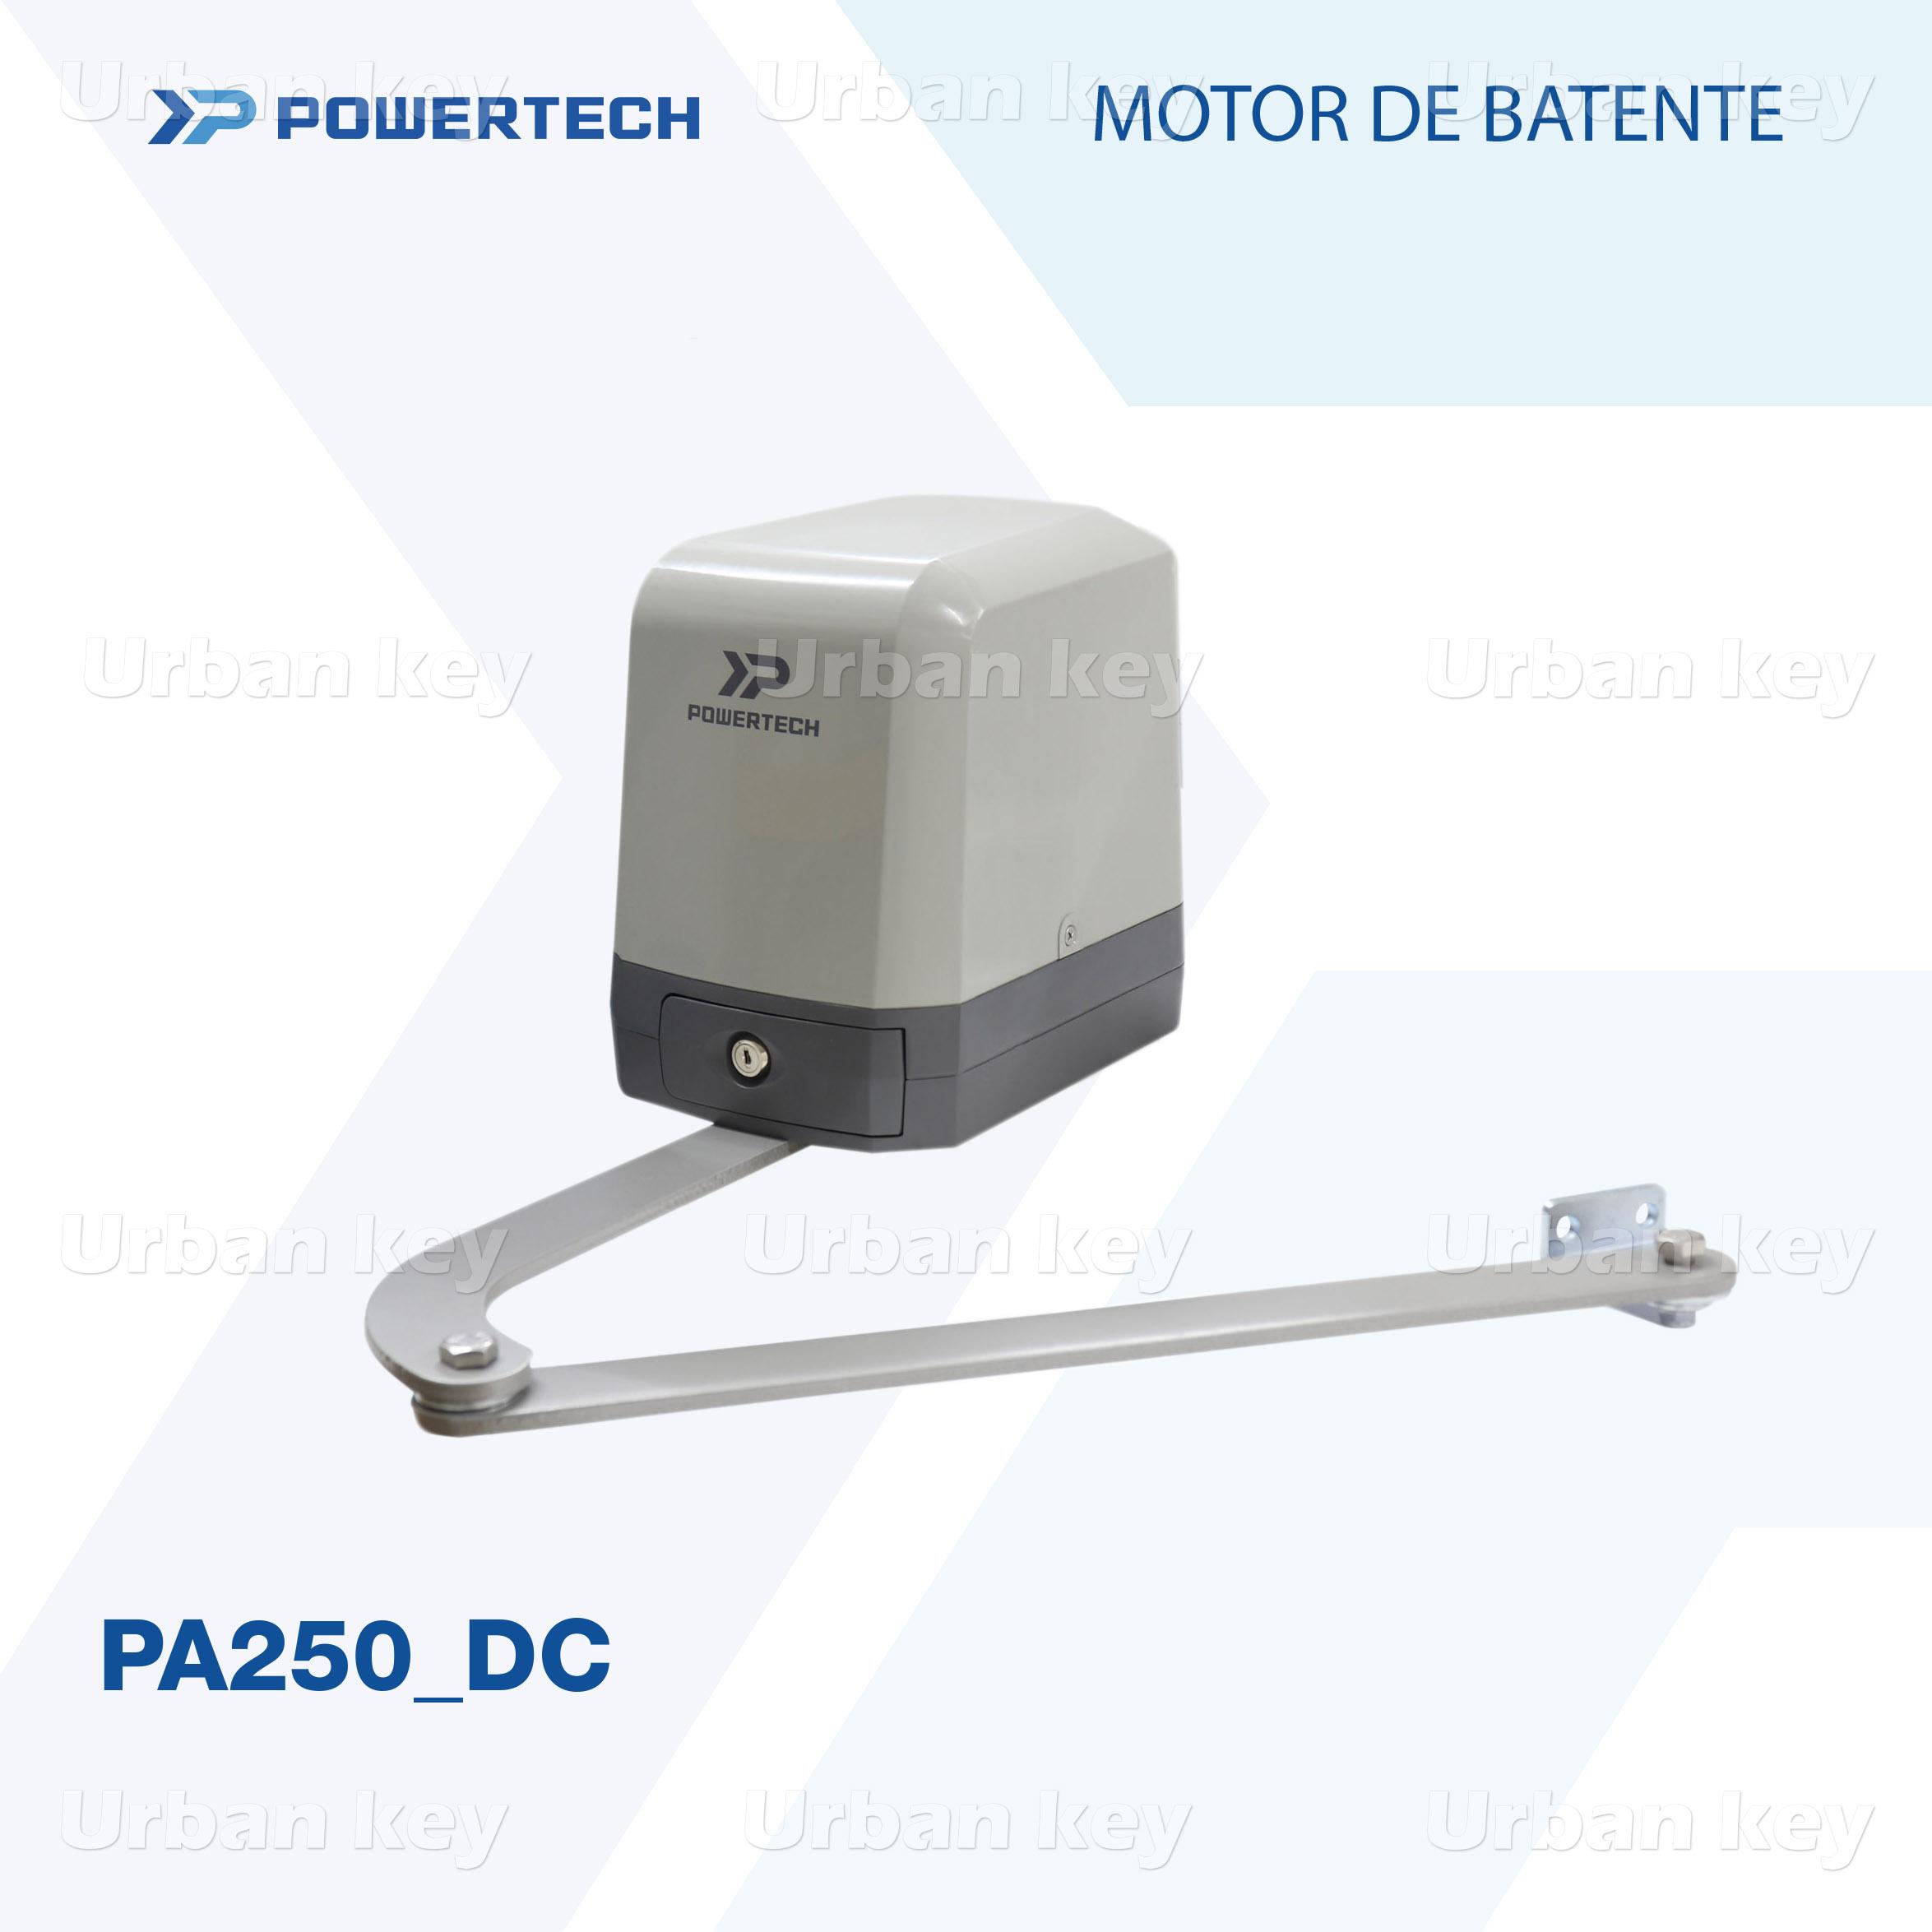 BRACO POWERTECH ARTICULADO PA250_DC